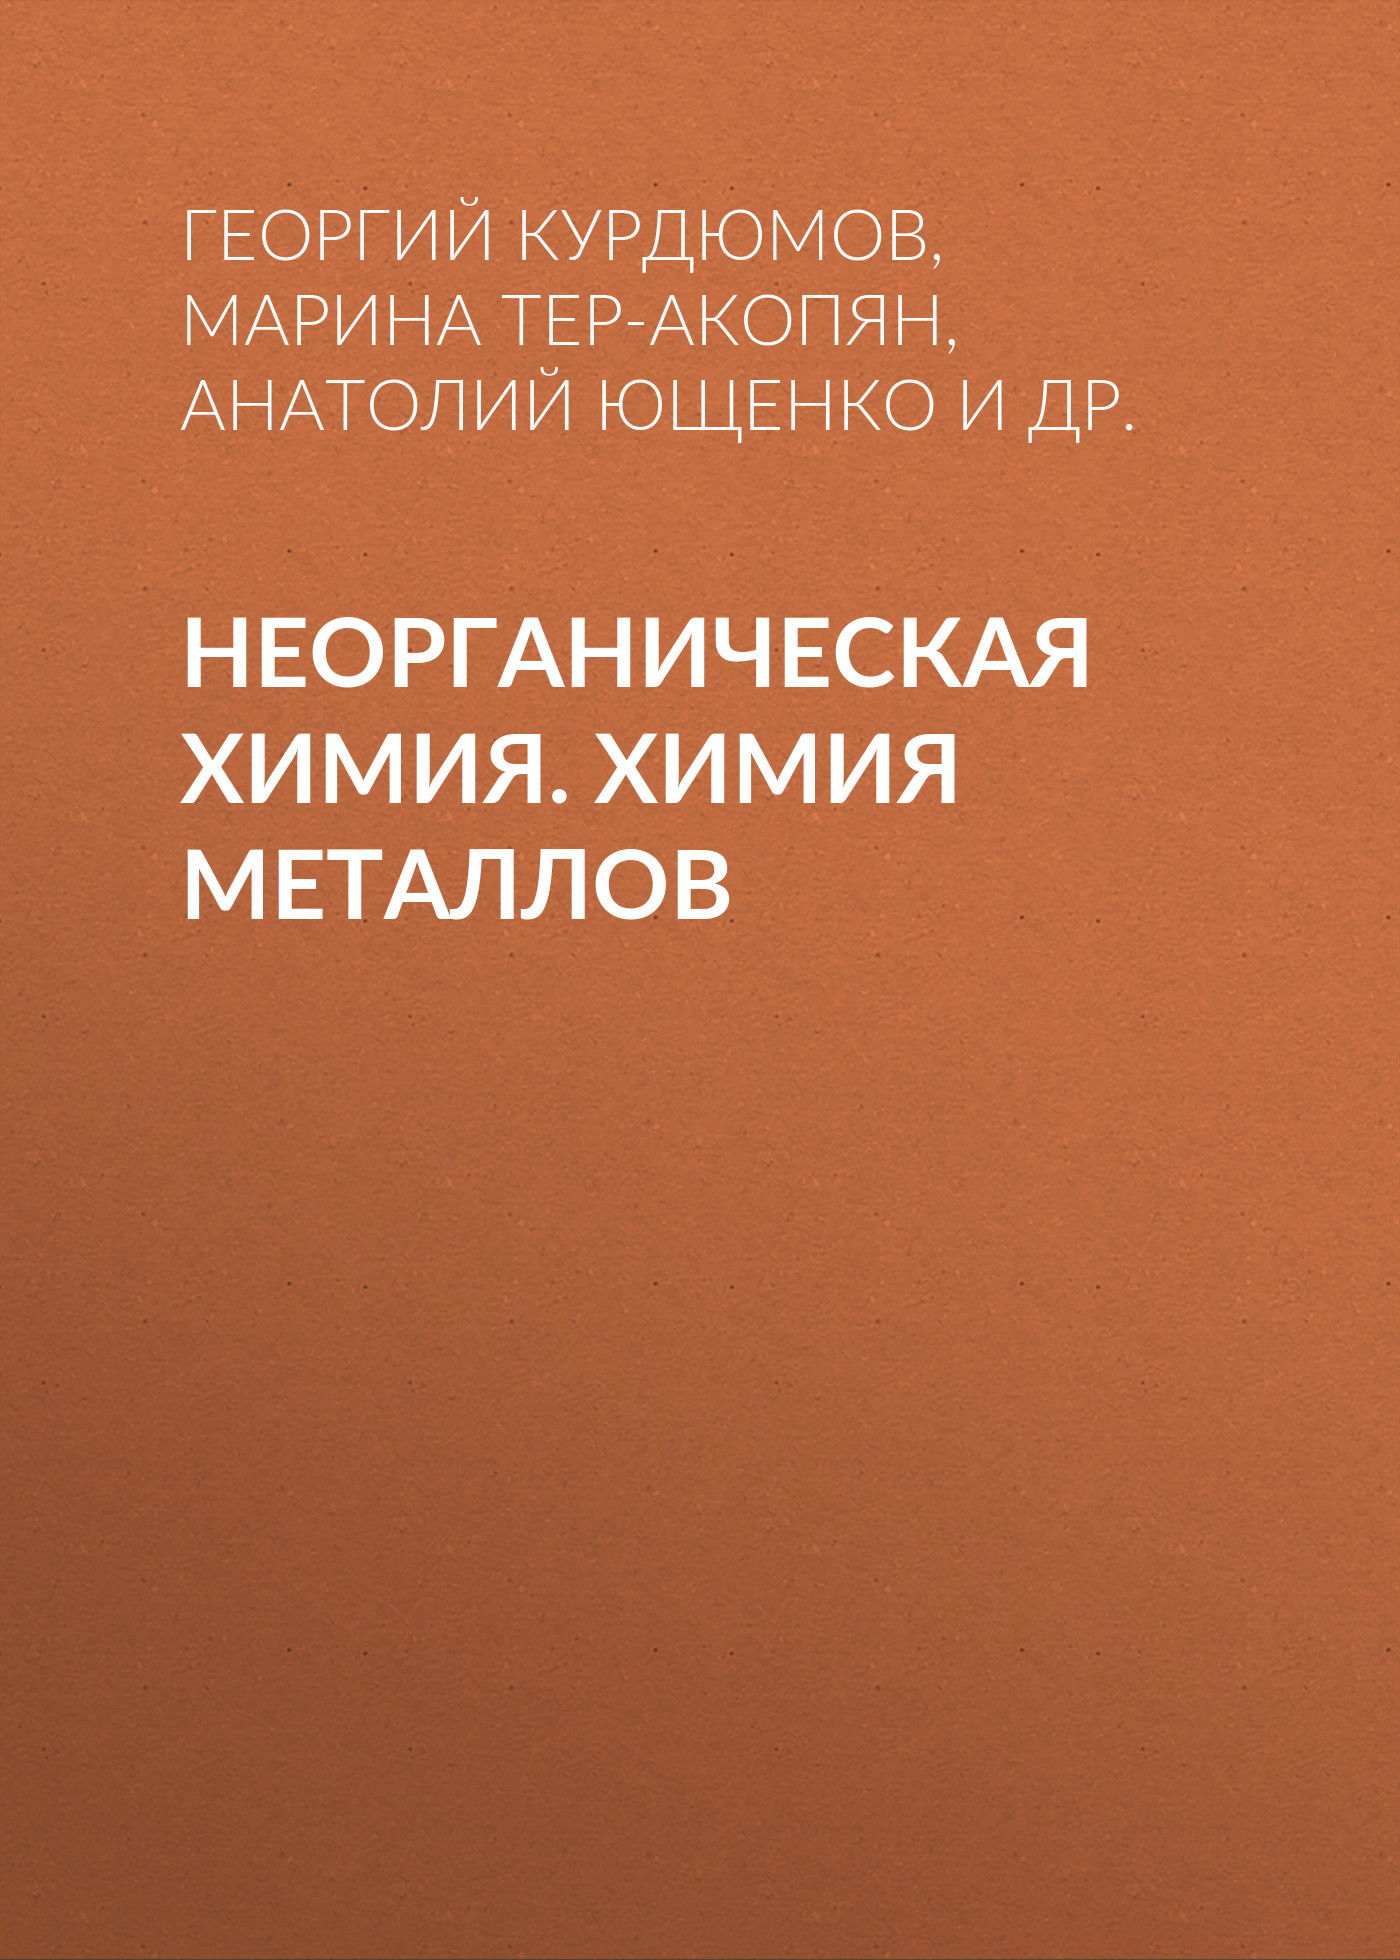 Марина Тер-Акопян бесплатно